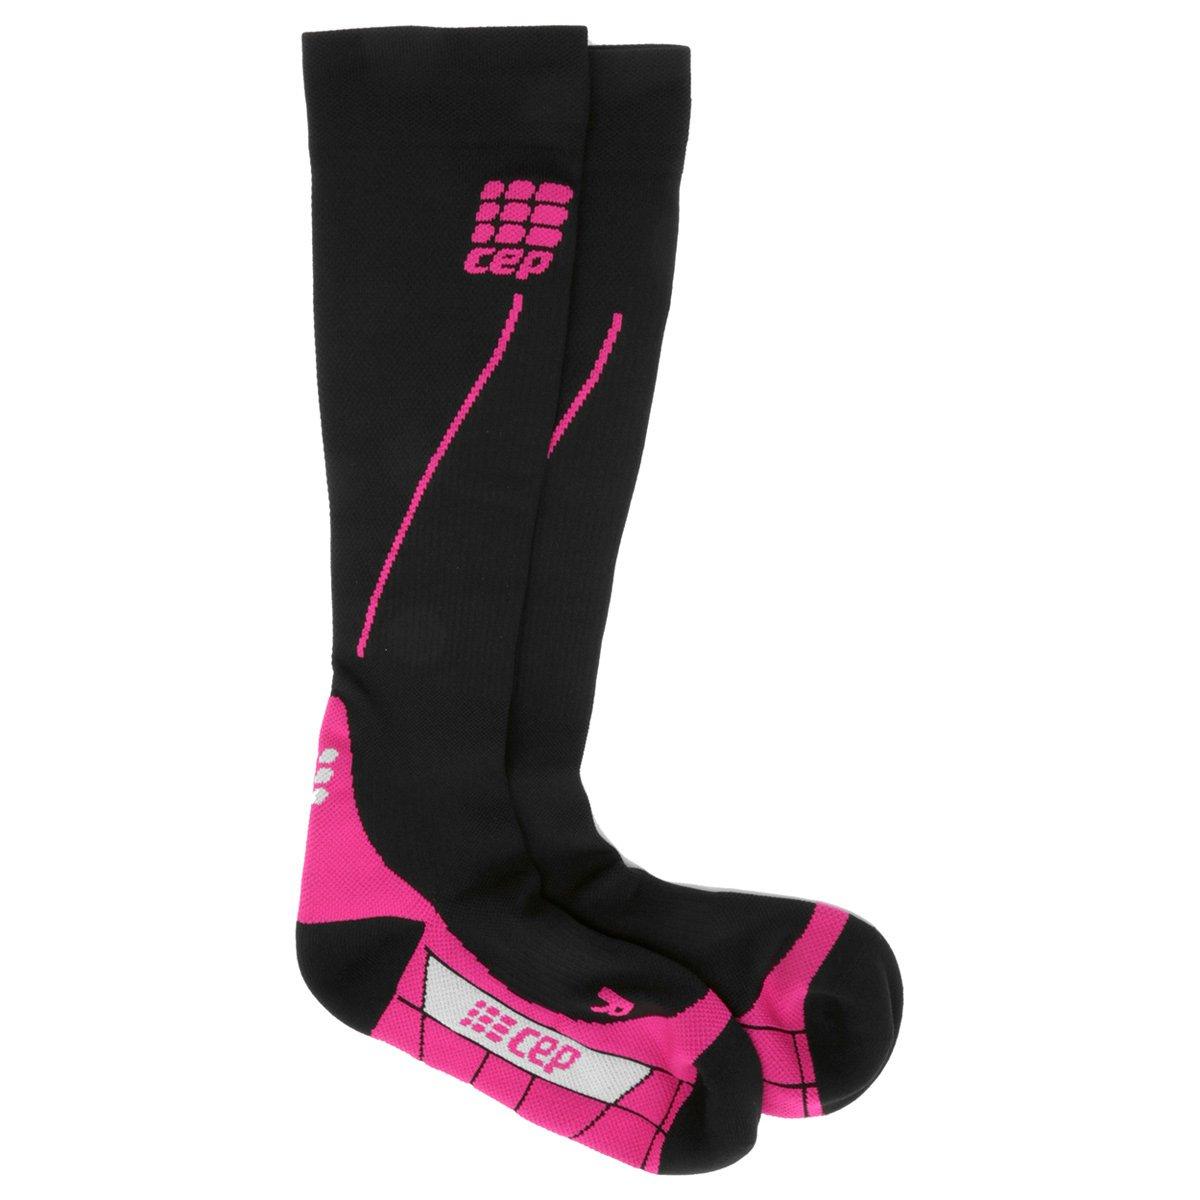 38 0 Pink cm De 2 Run Preto e Panturillha Meia 32 CEP Compressão xUO8wq6